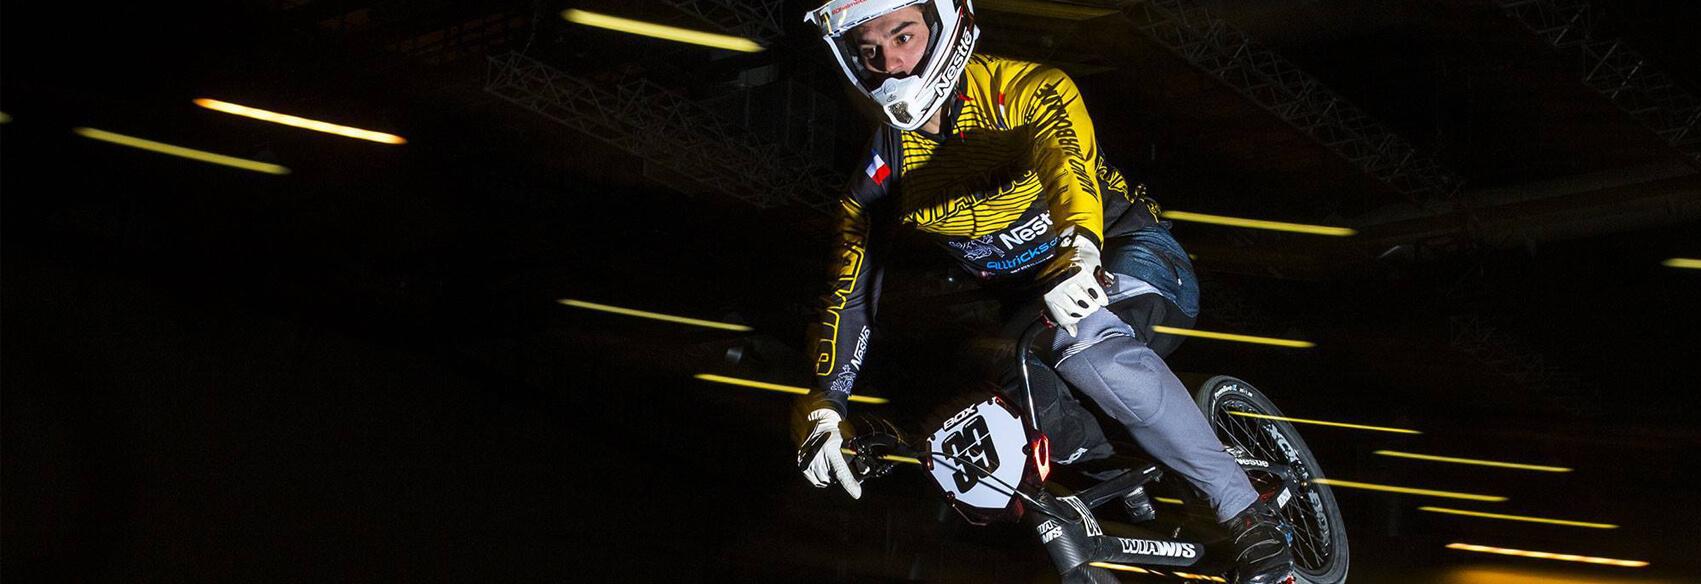 Sylvain Andre Fifteen BMX - Fabmx1.com